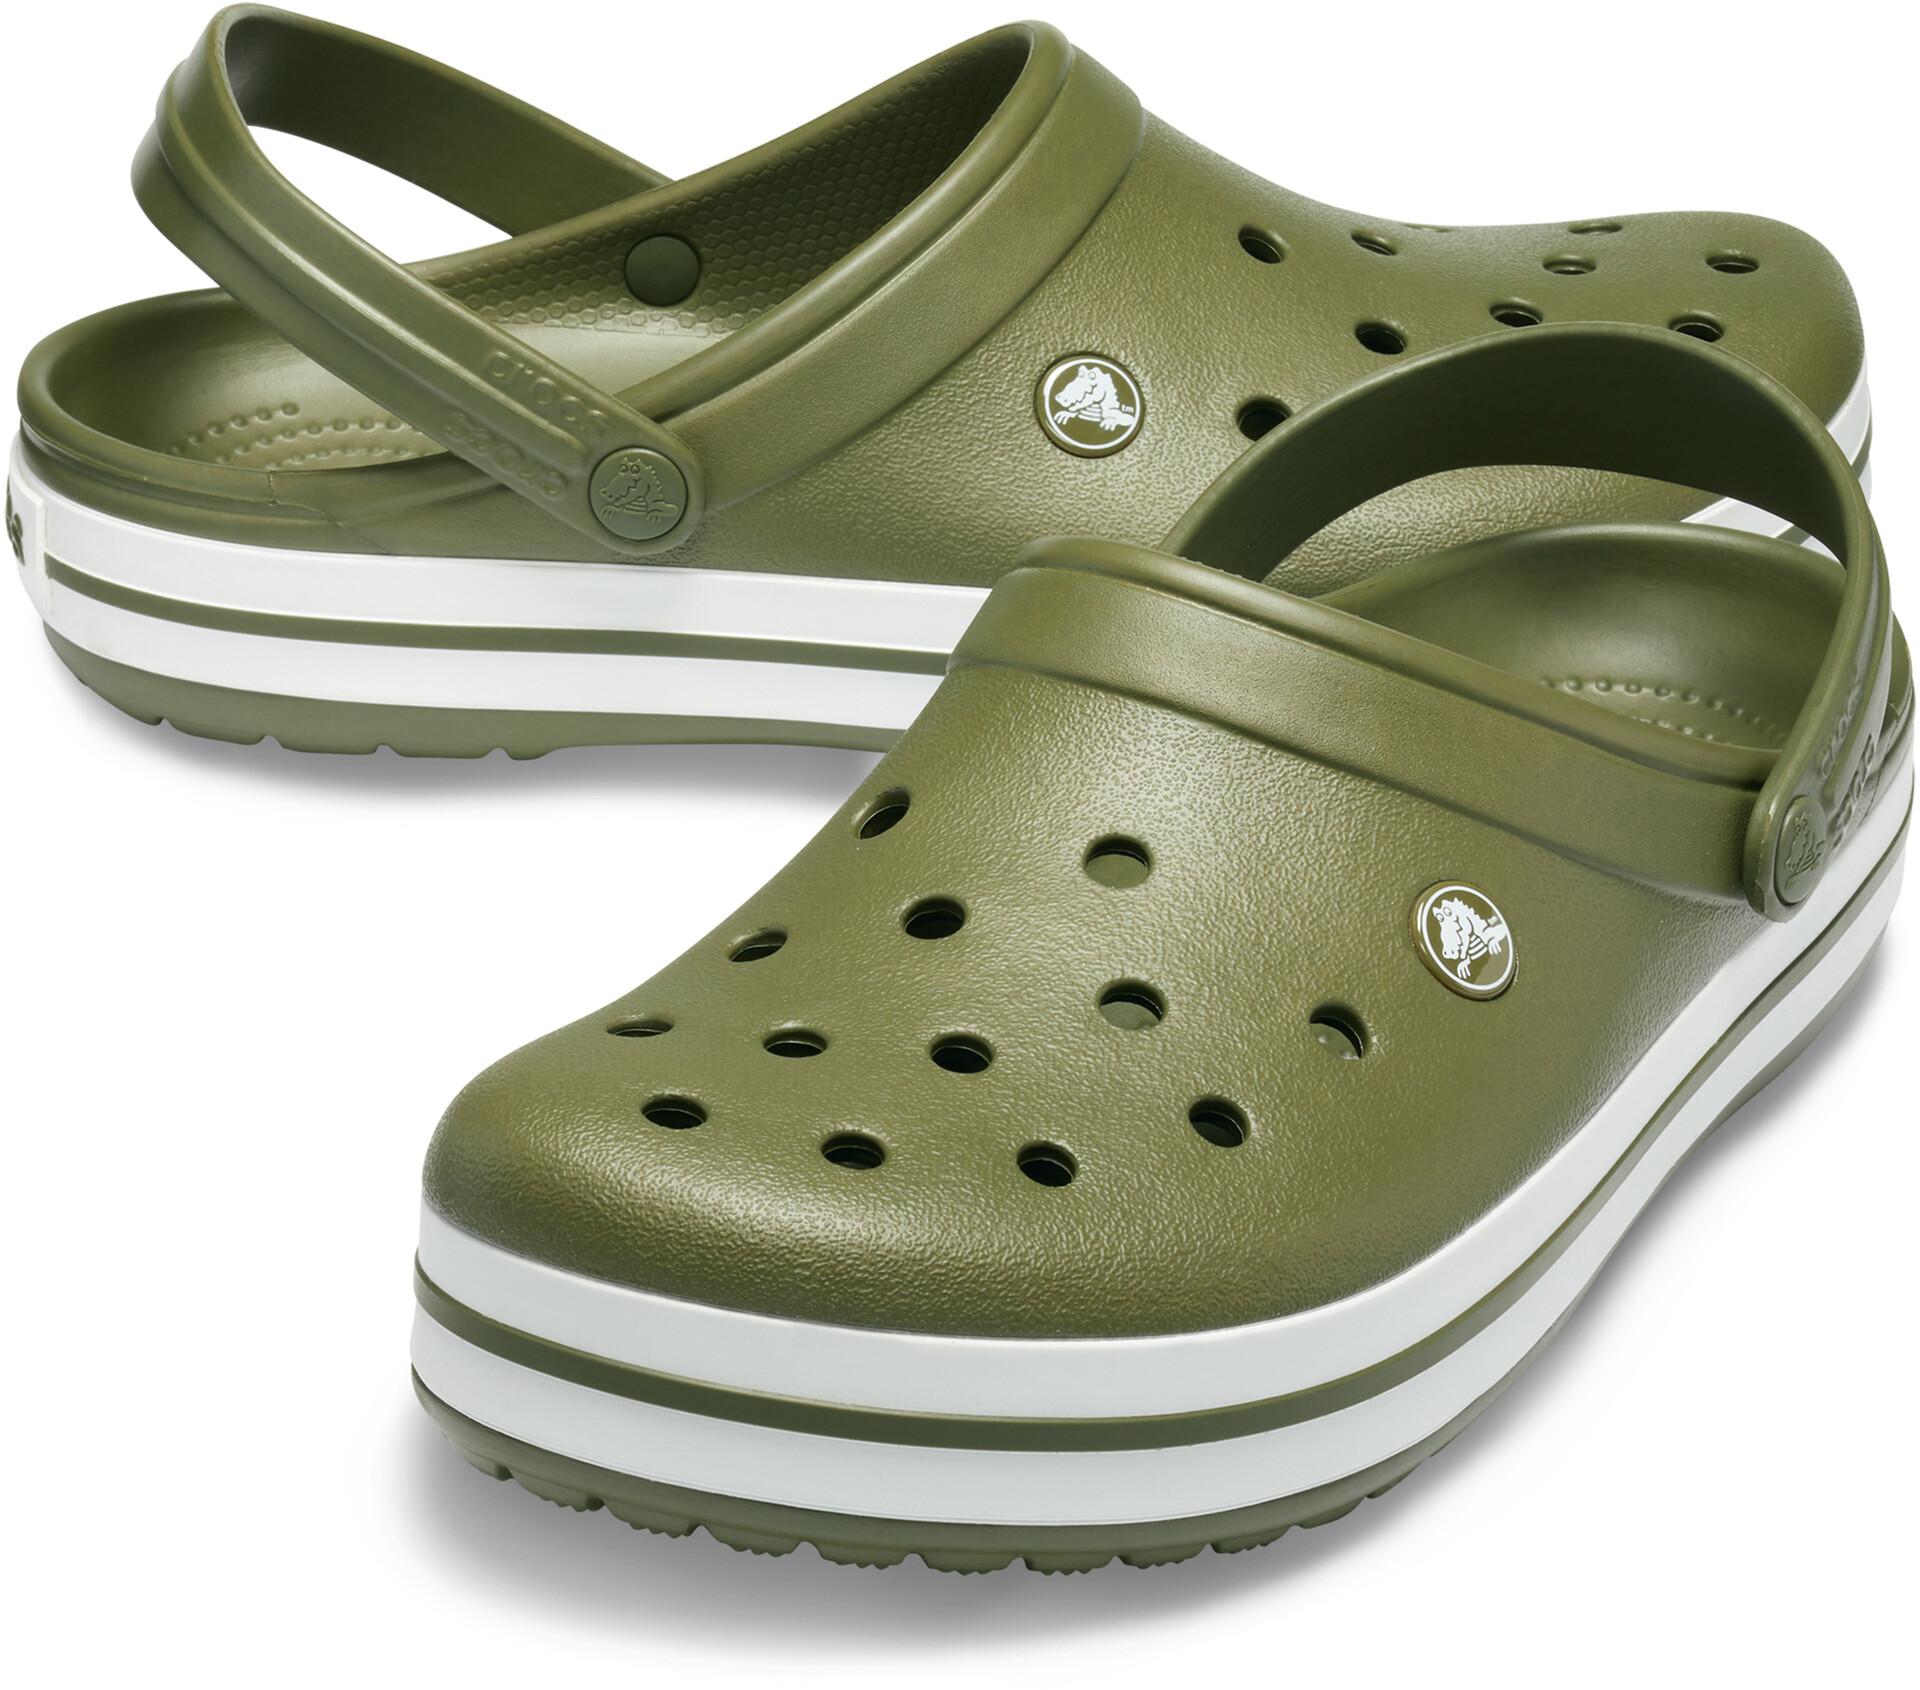 Crocs Crocband Crocs, army greenwhite